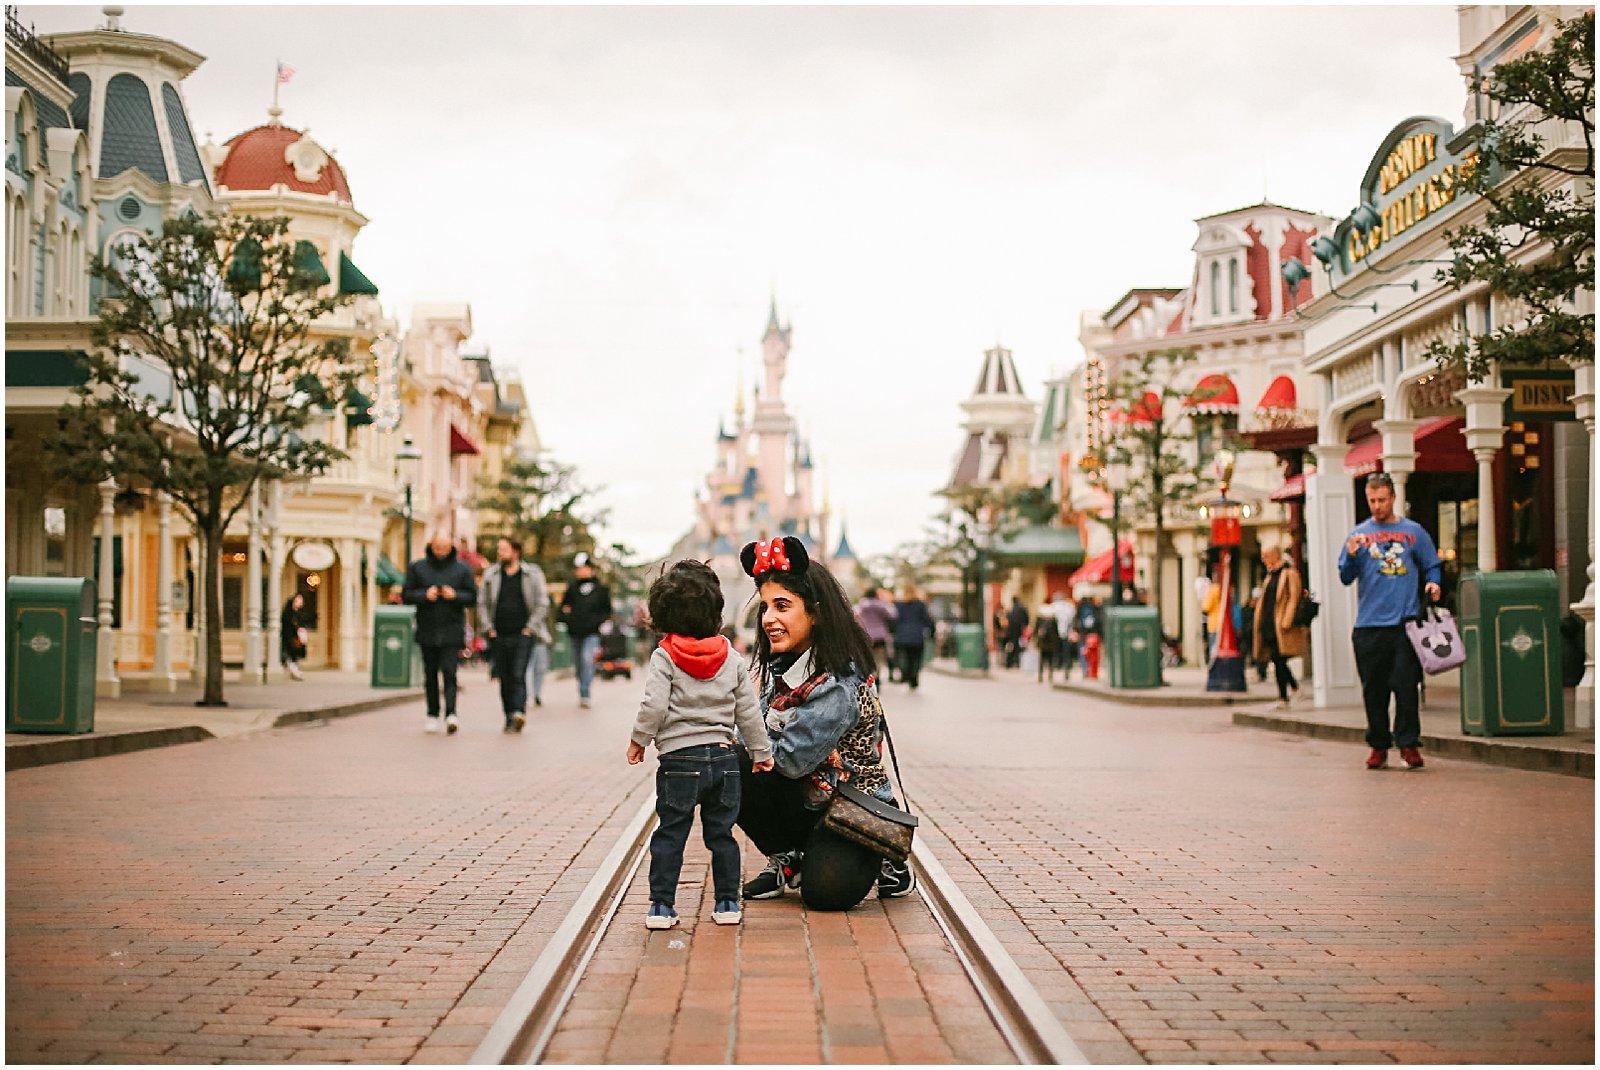 family photographed at Disneyland Paris photoshoot with France photographer helena woods